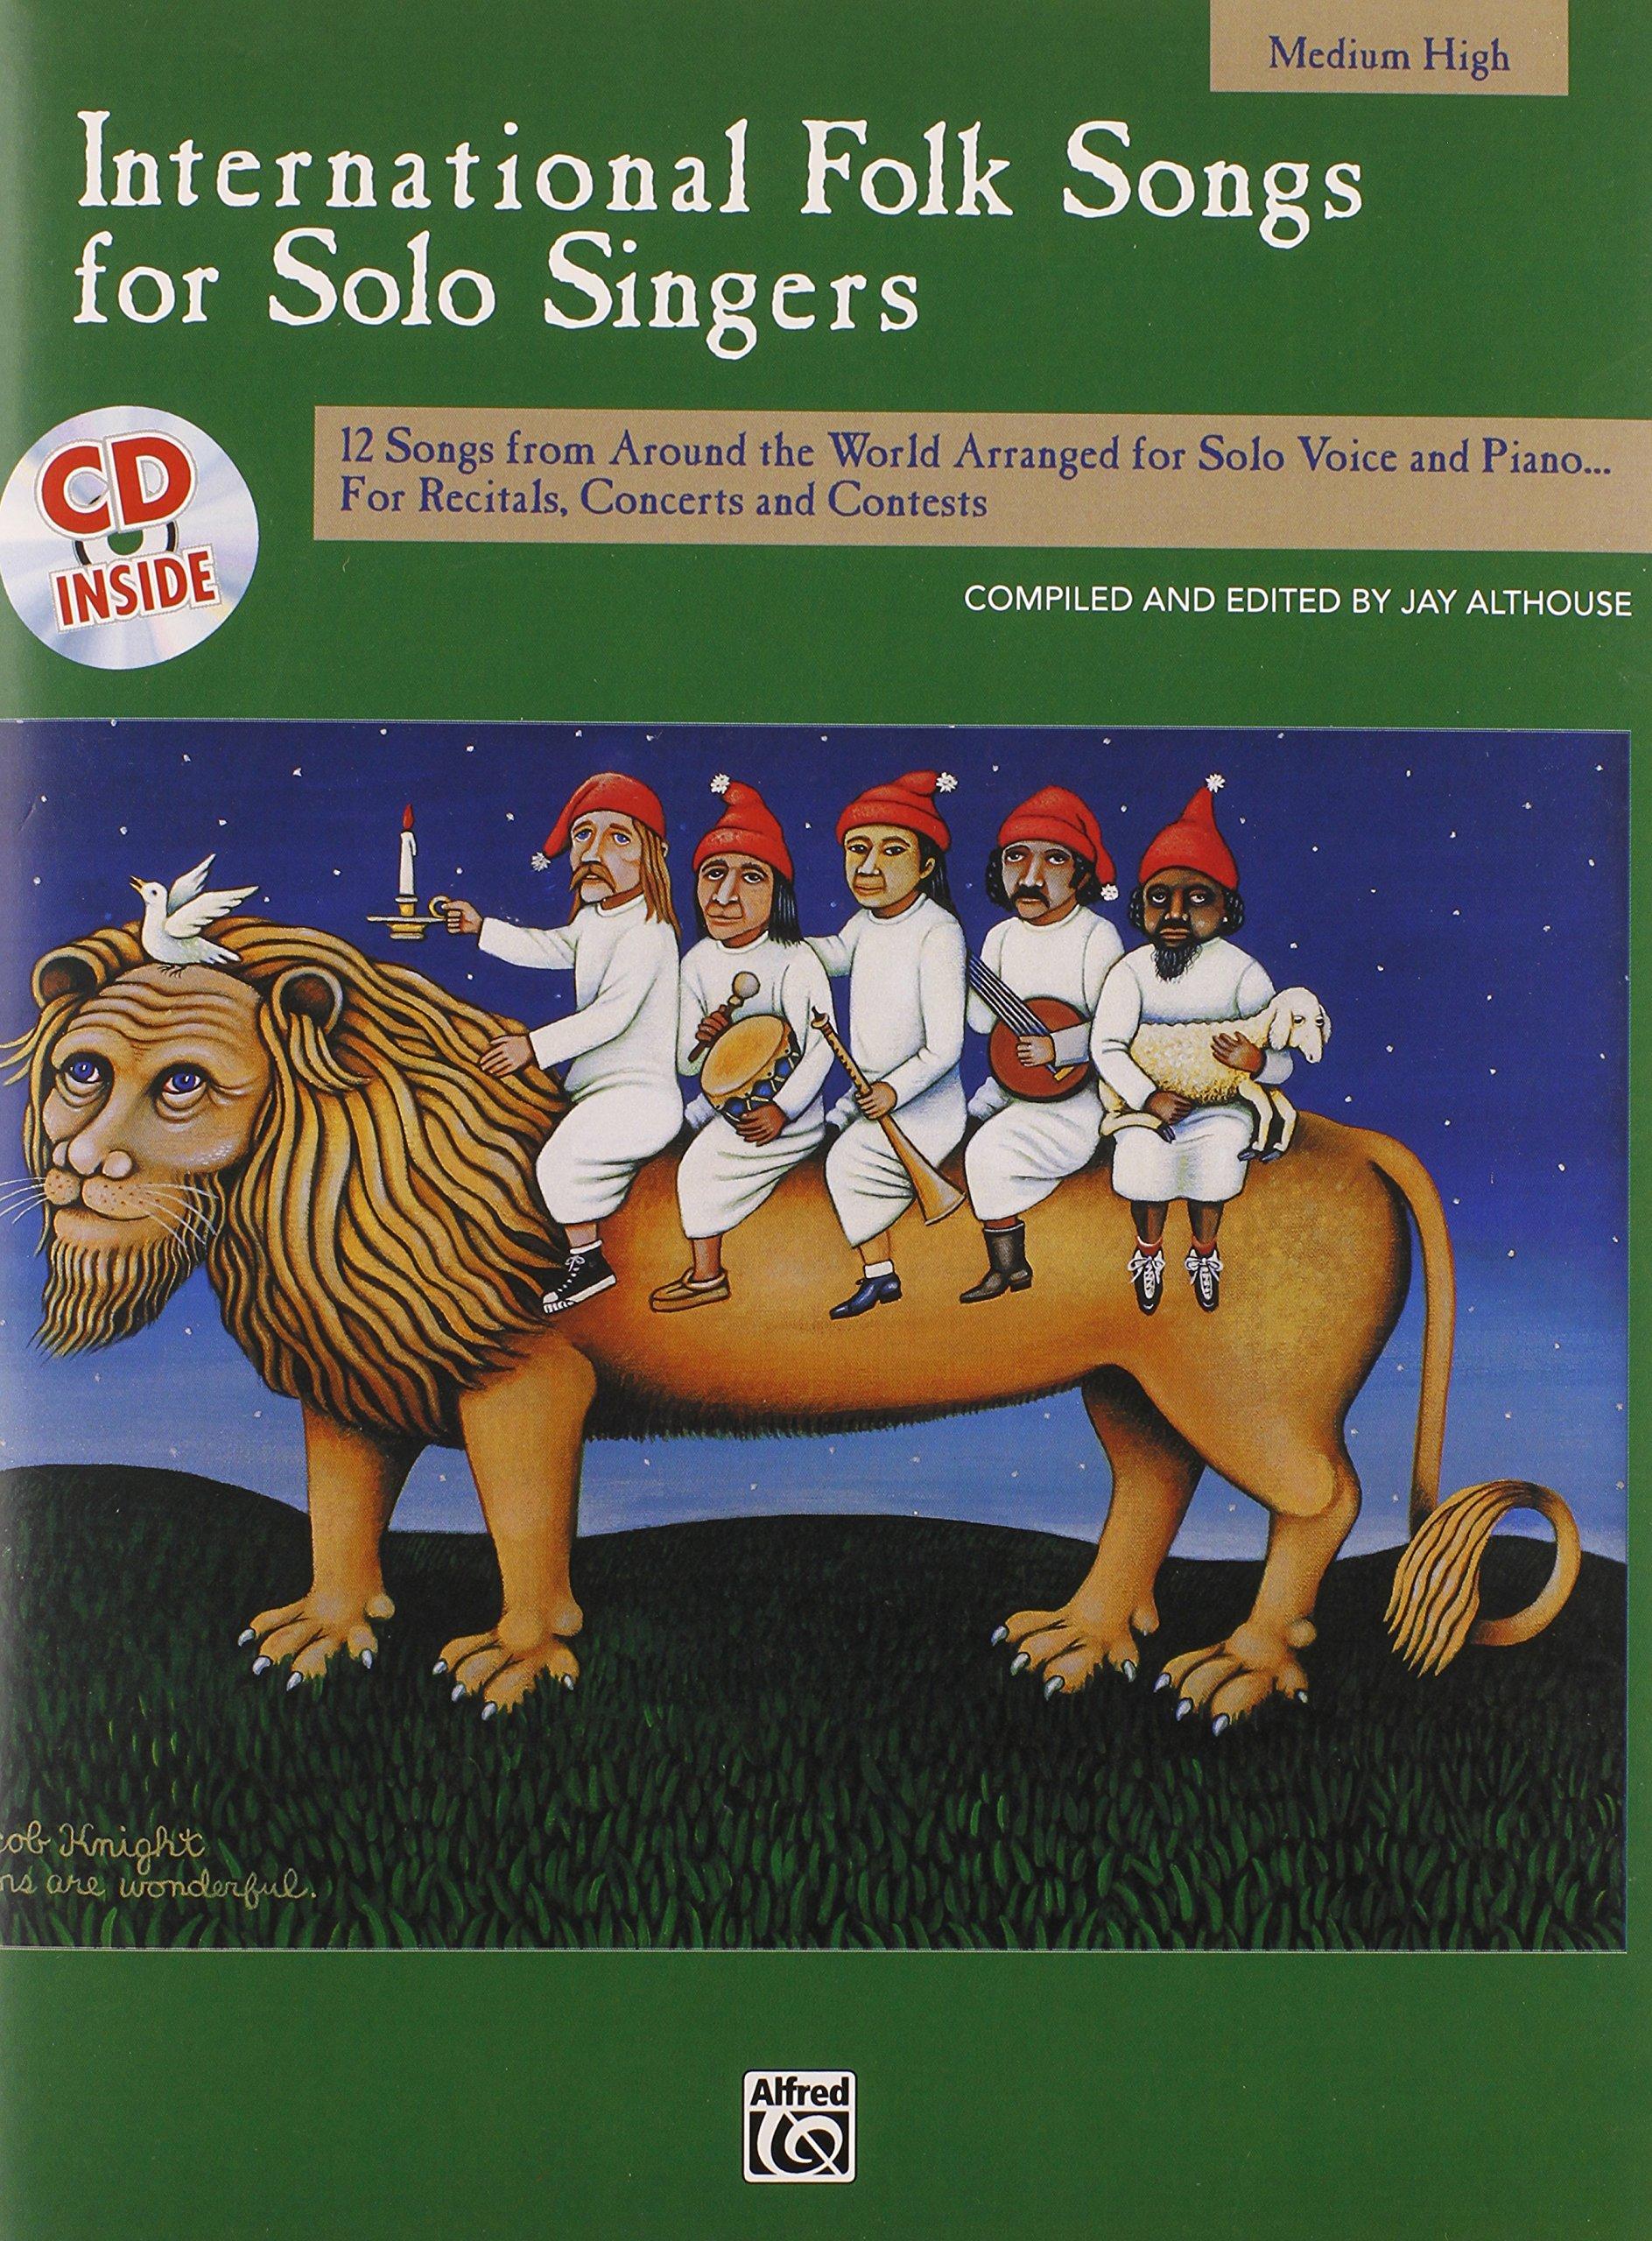 International Folk Songs for Solo Singers: Medium High Voice, Book & CD